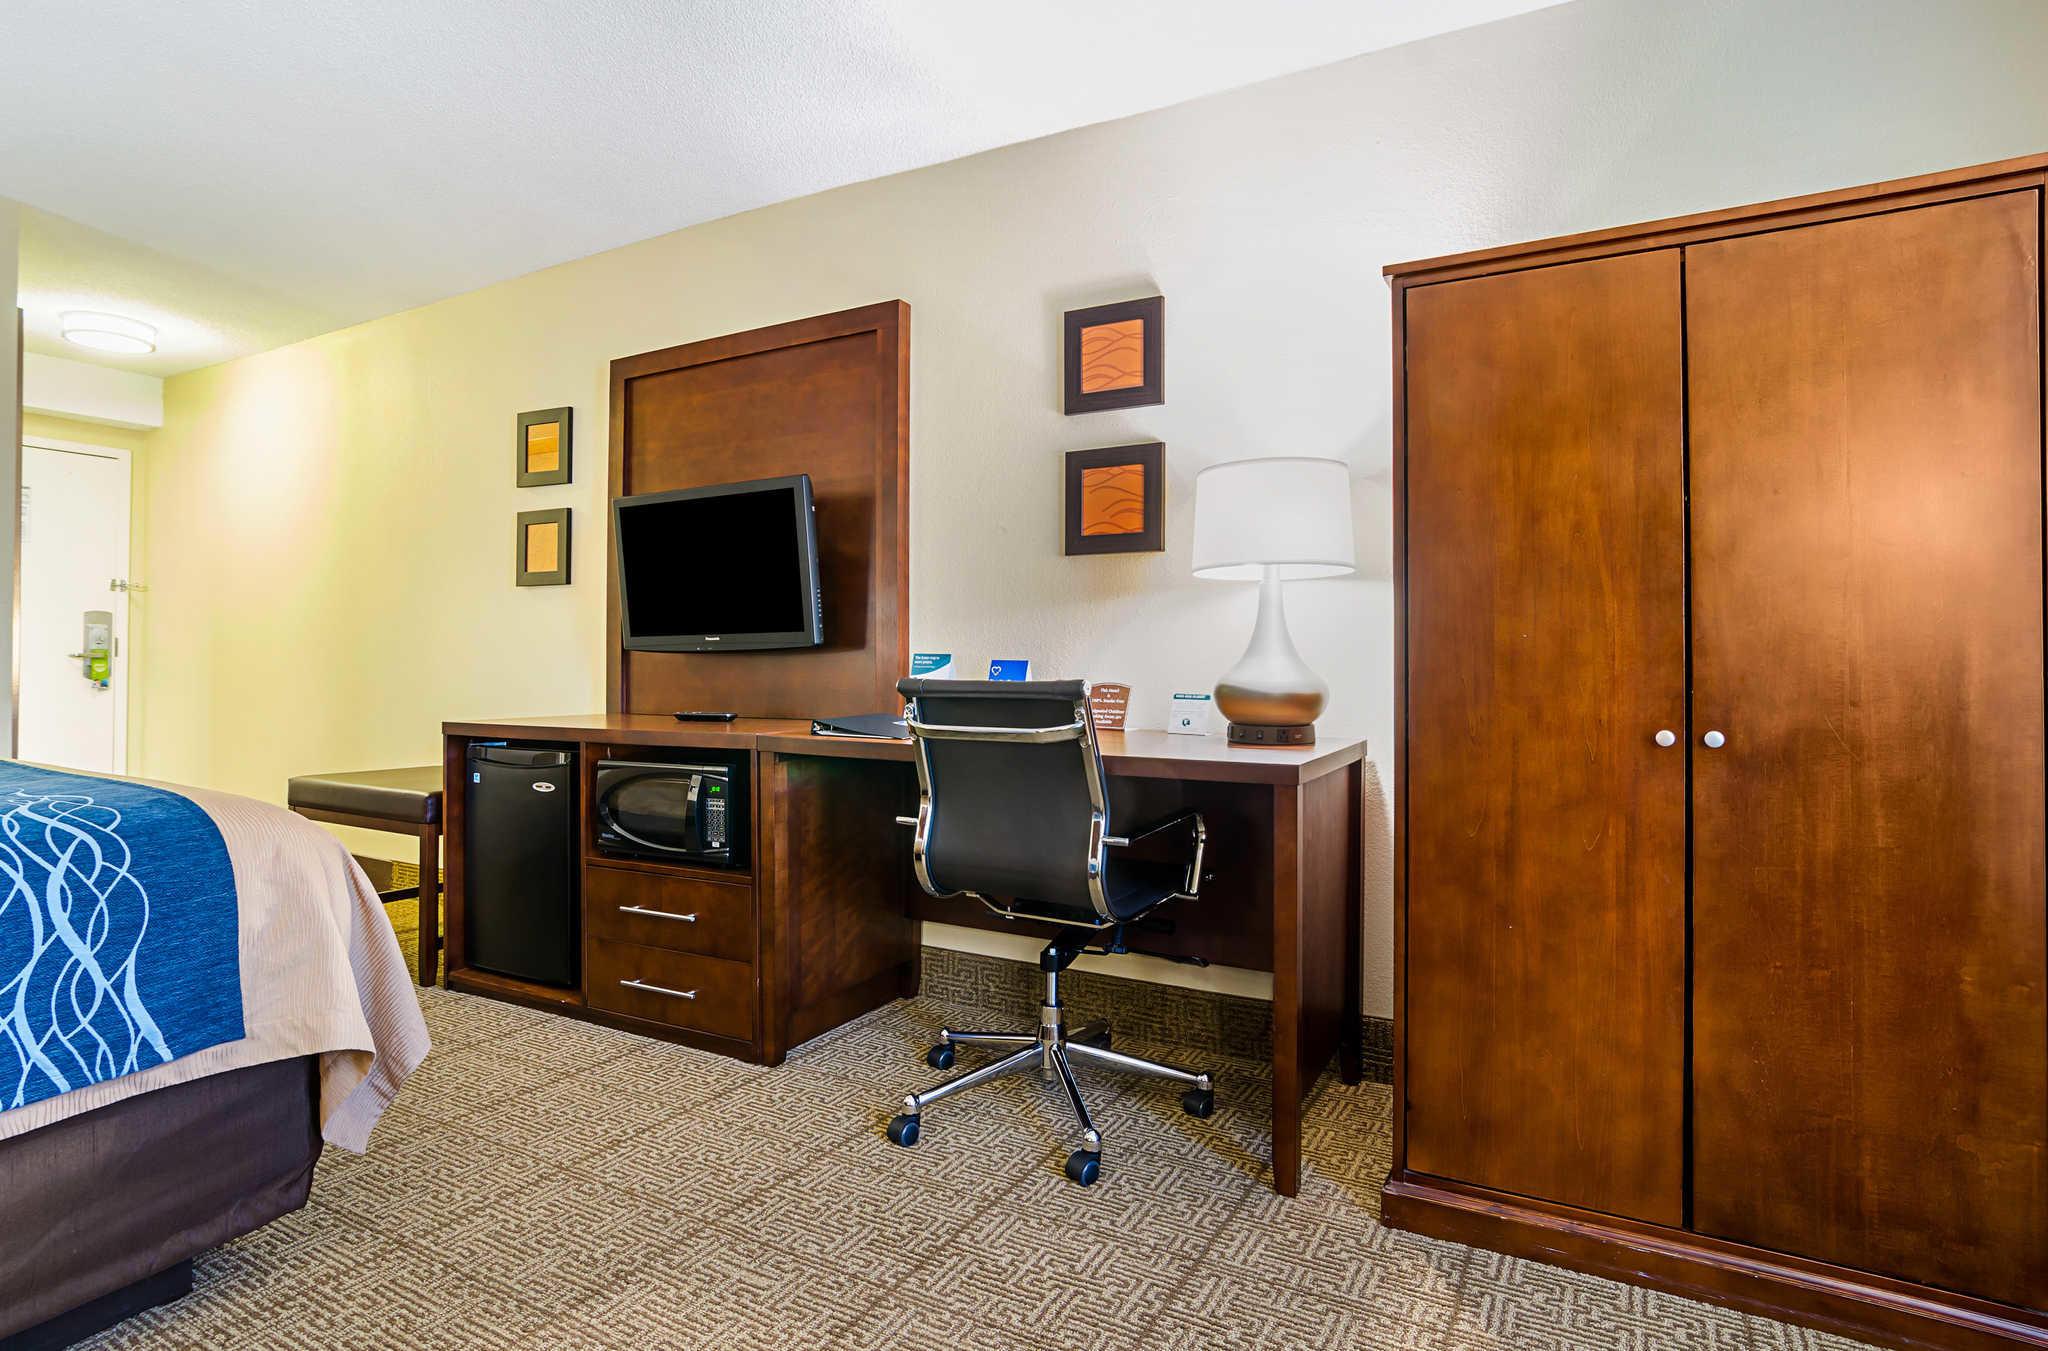 Comfort Inn & Suites Duke University-Downtown image 19